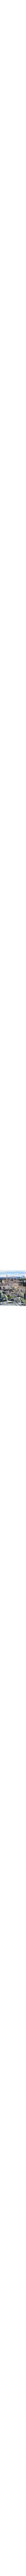 Art Decor Jerusalem - Rolled canvas print